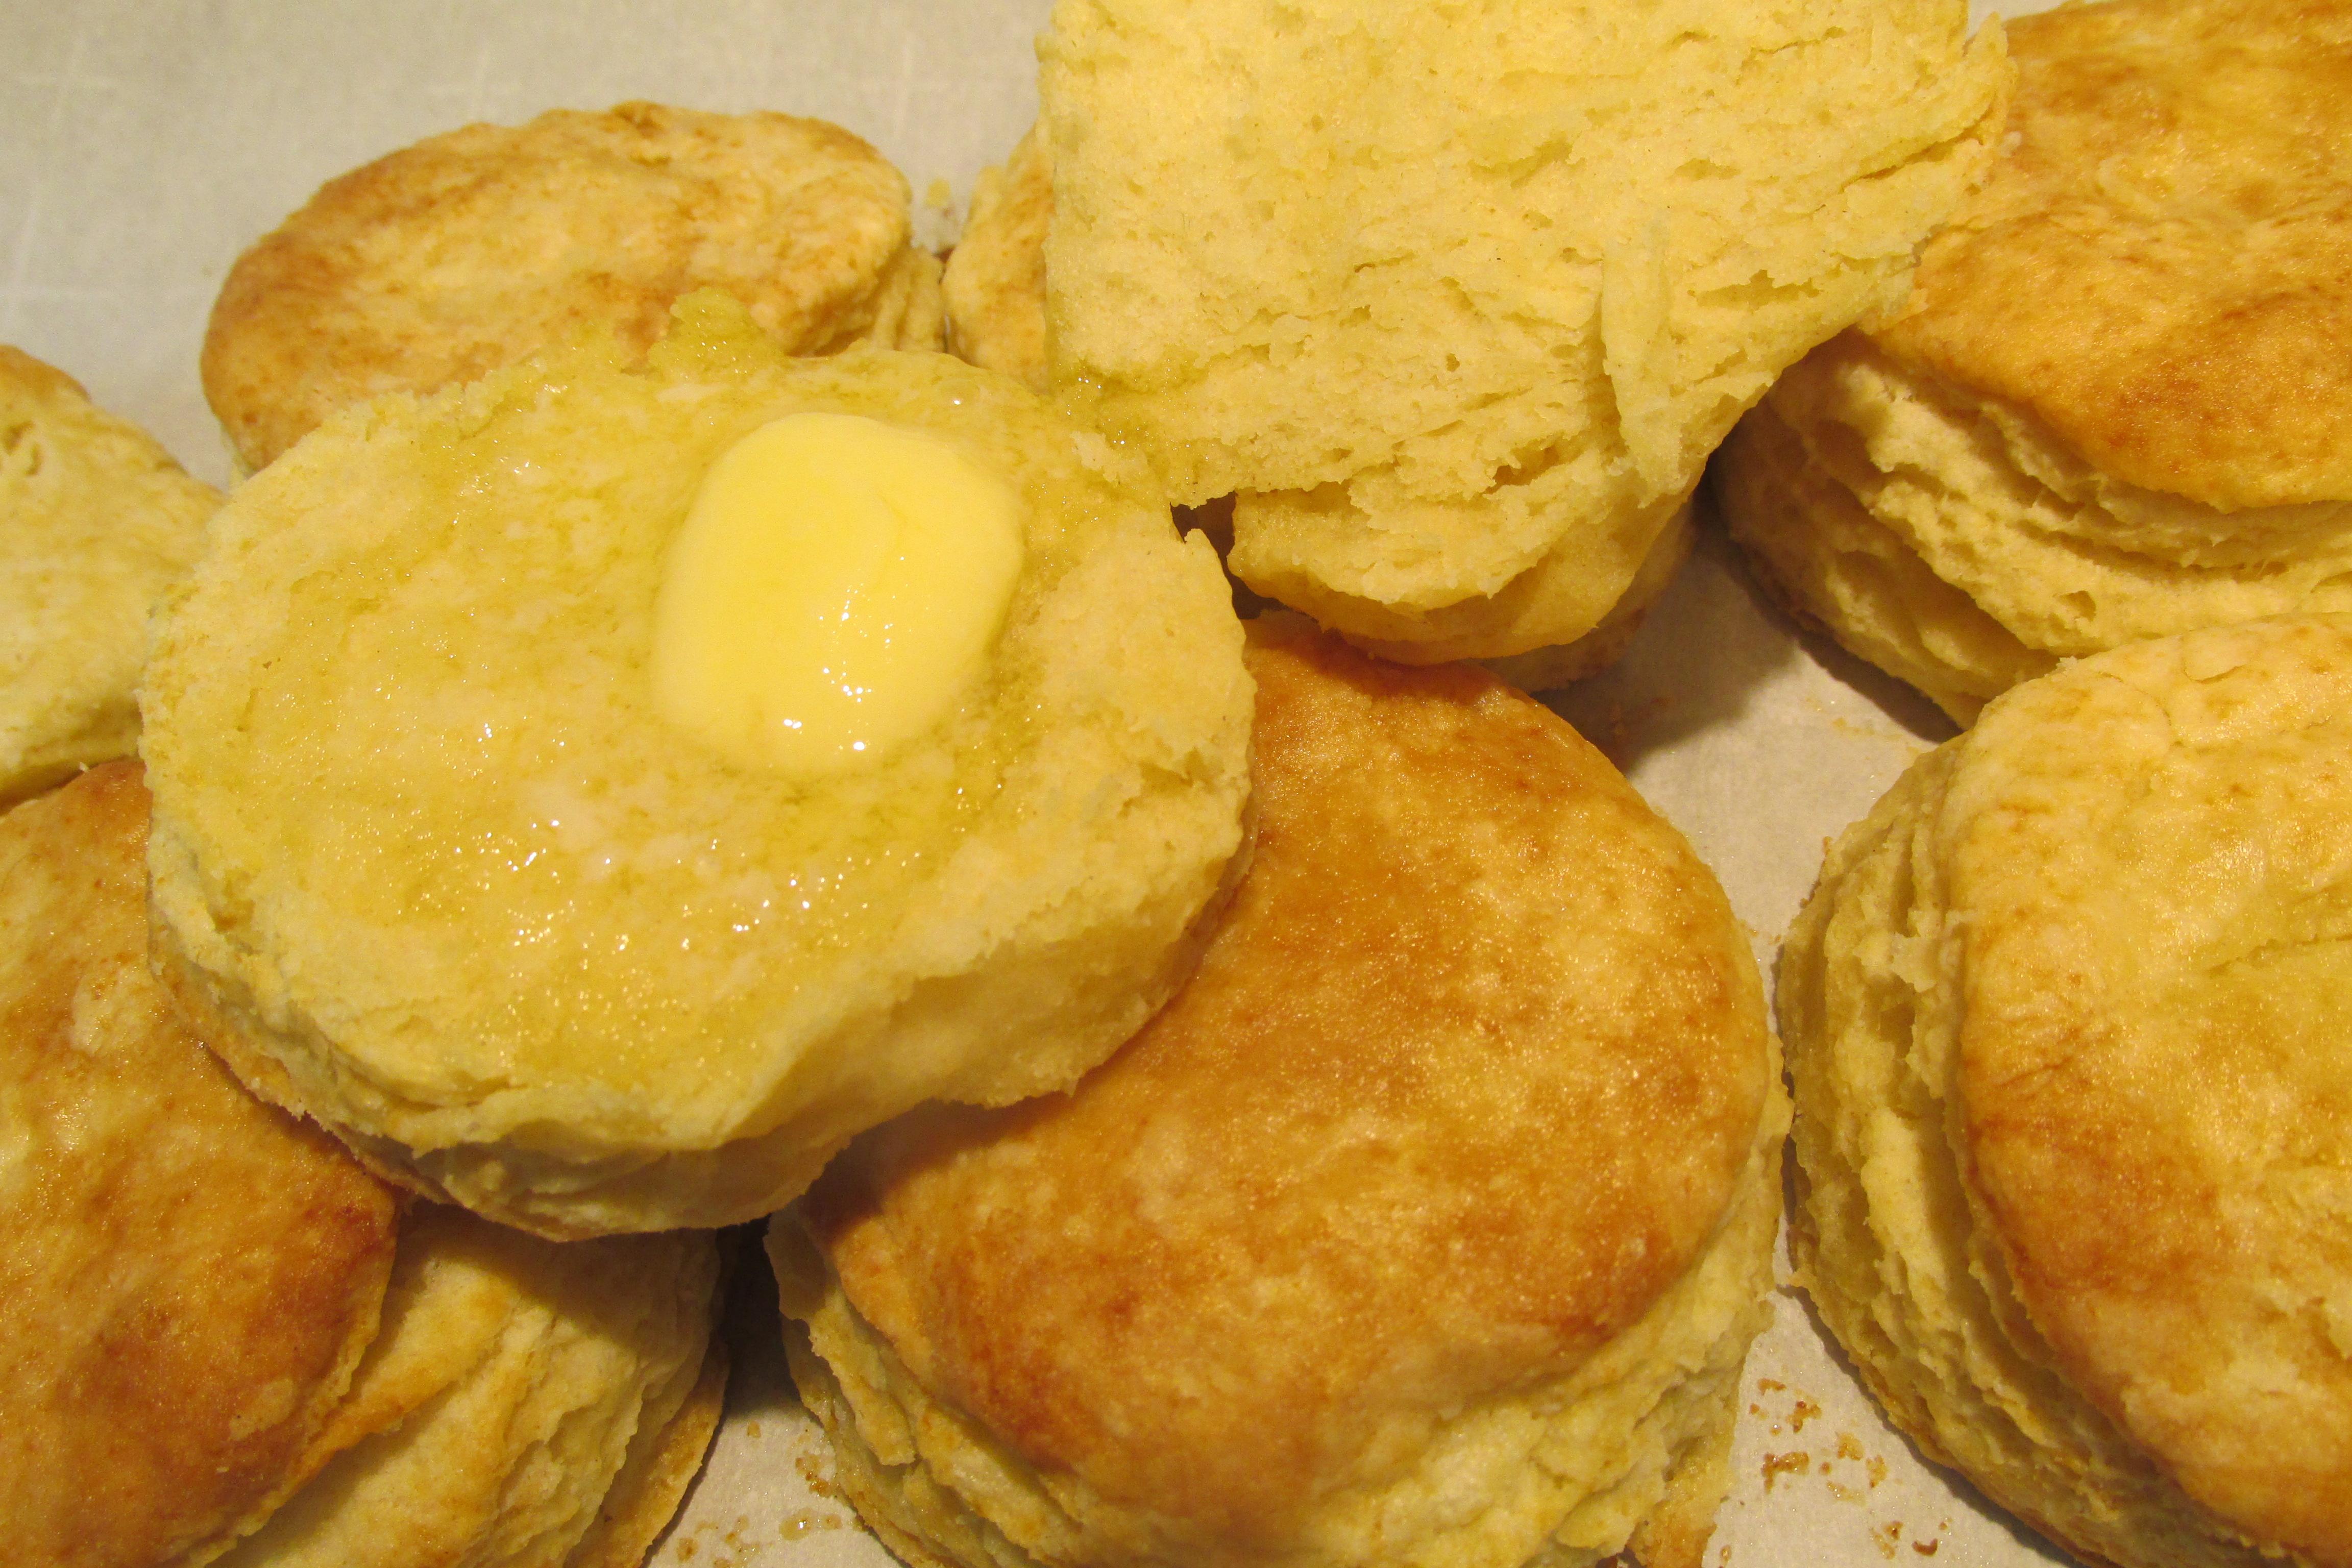 Chef John's Buttermilk Biscuits